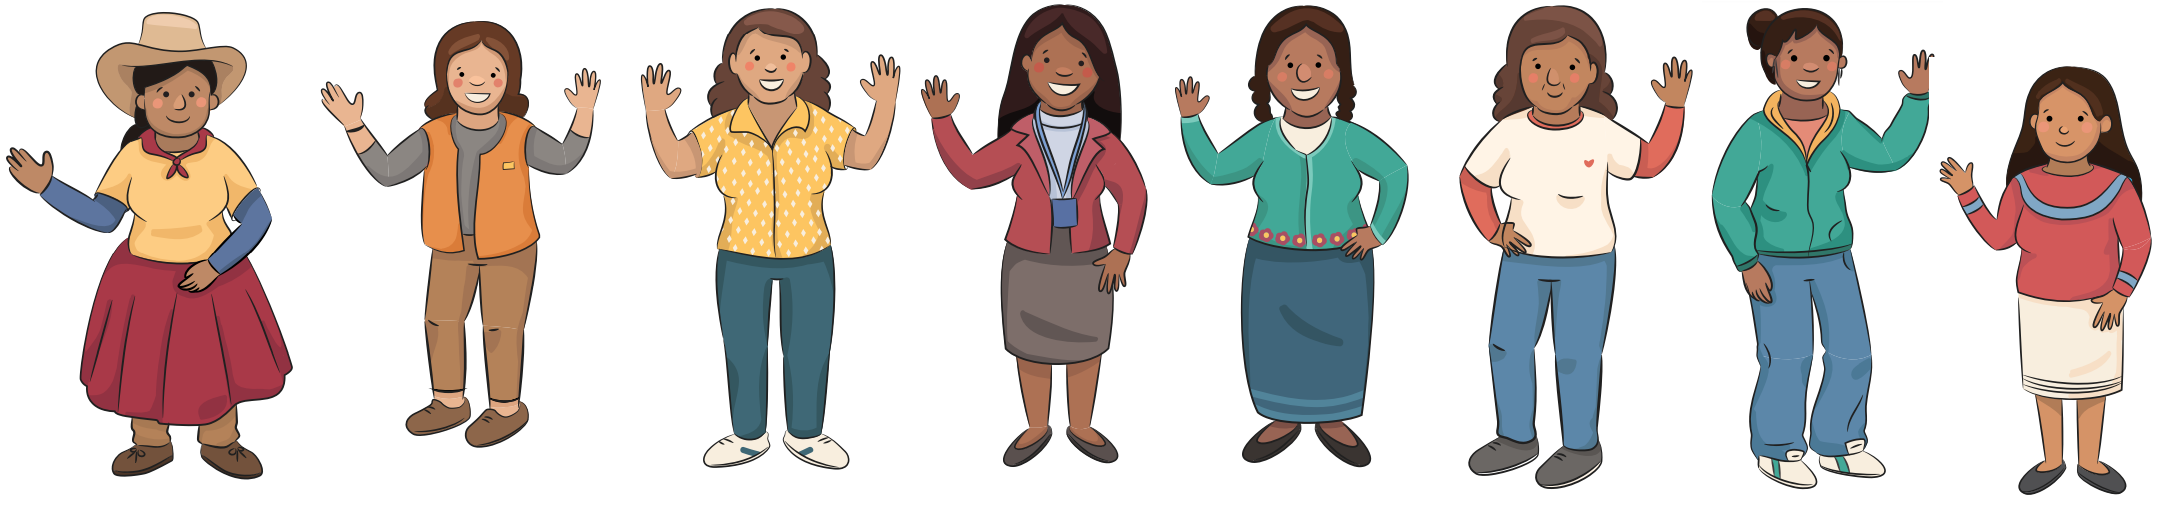 edad etnia género mujeres